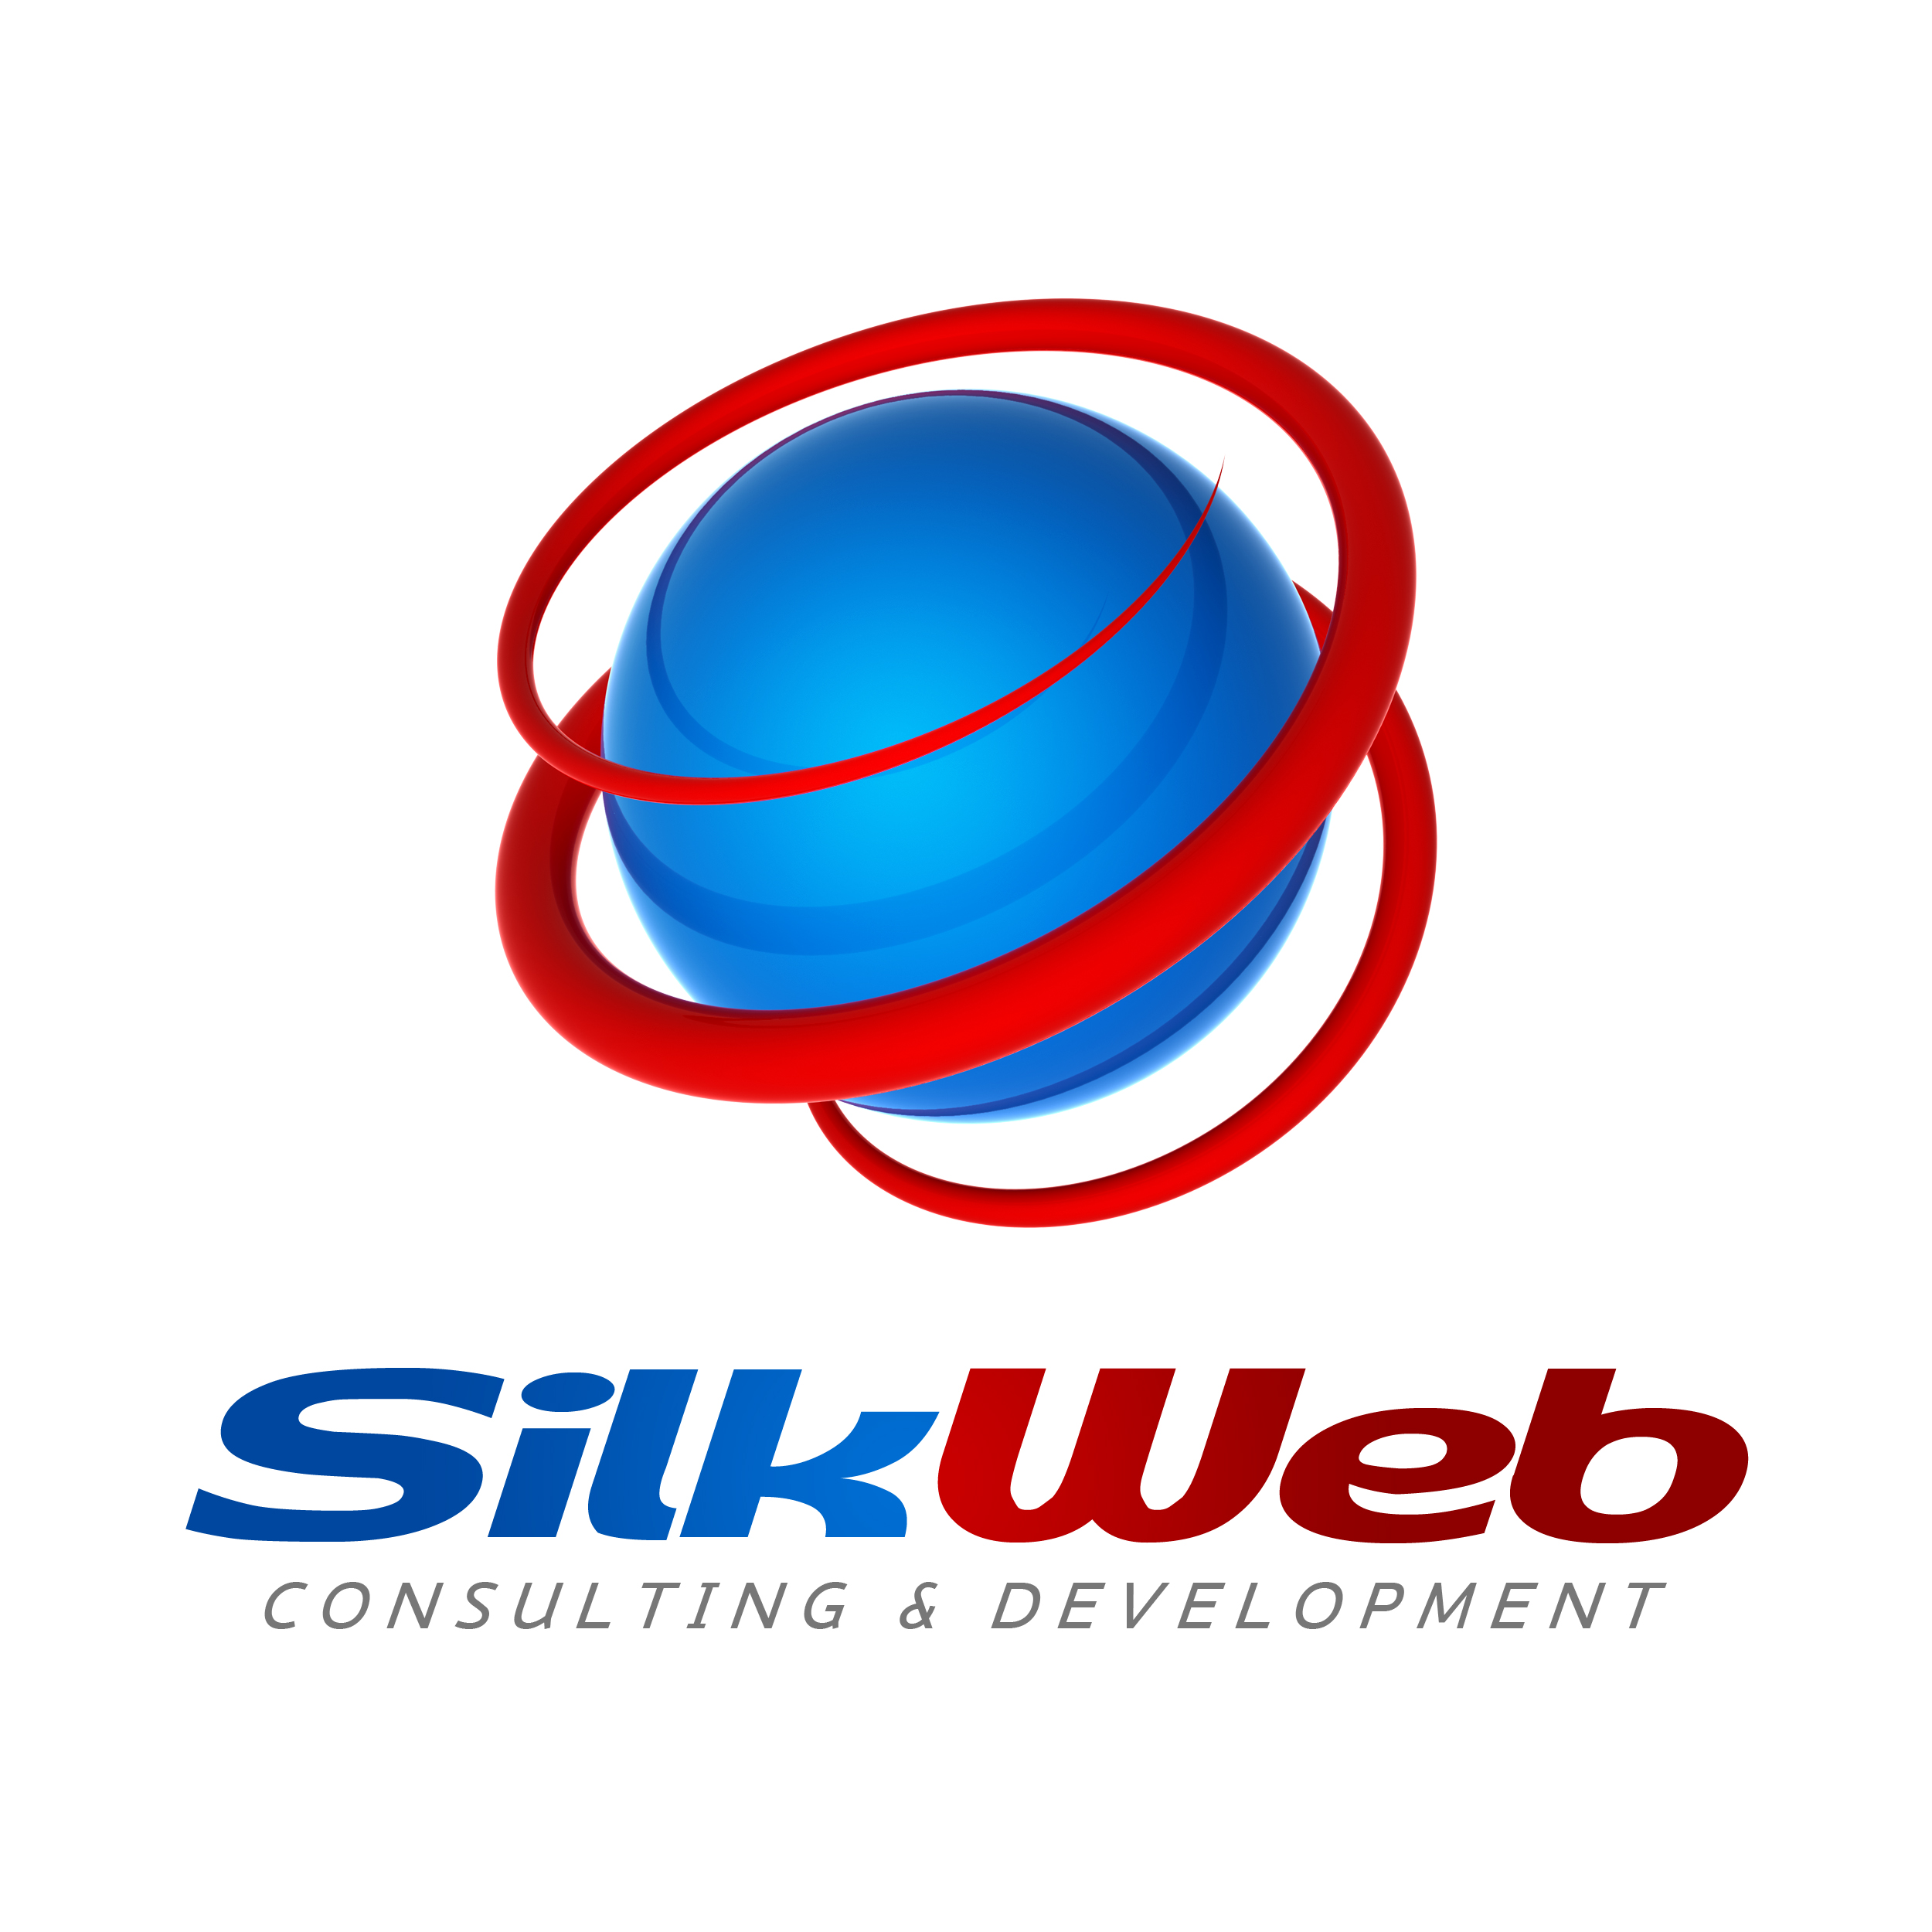 SilkWeb Consulting and Development LLC